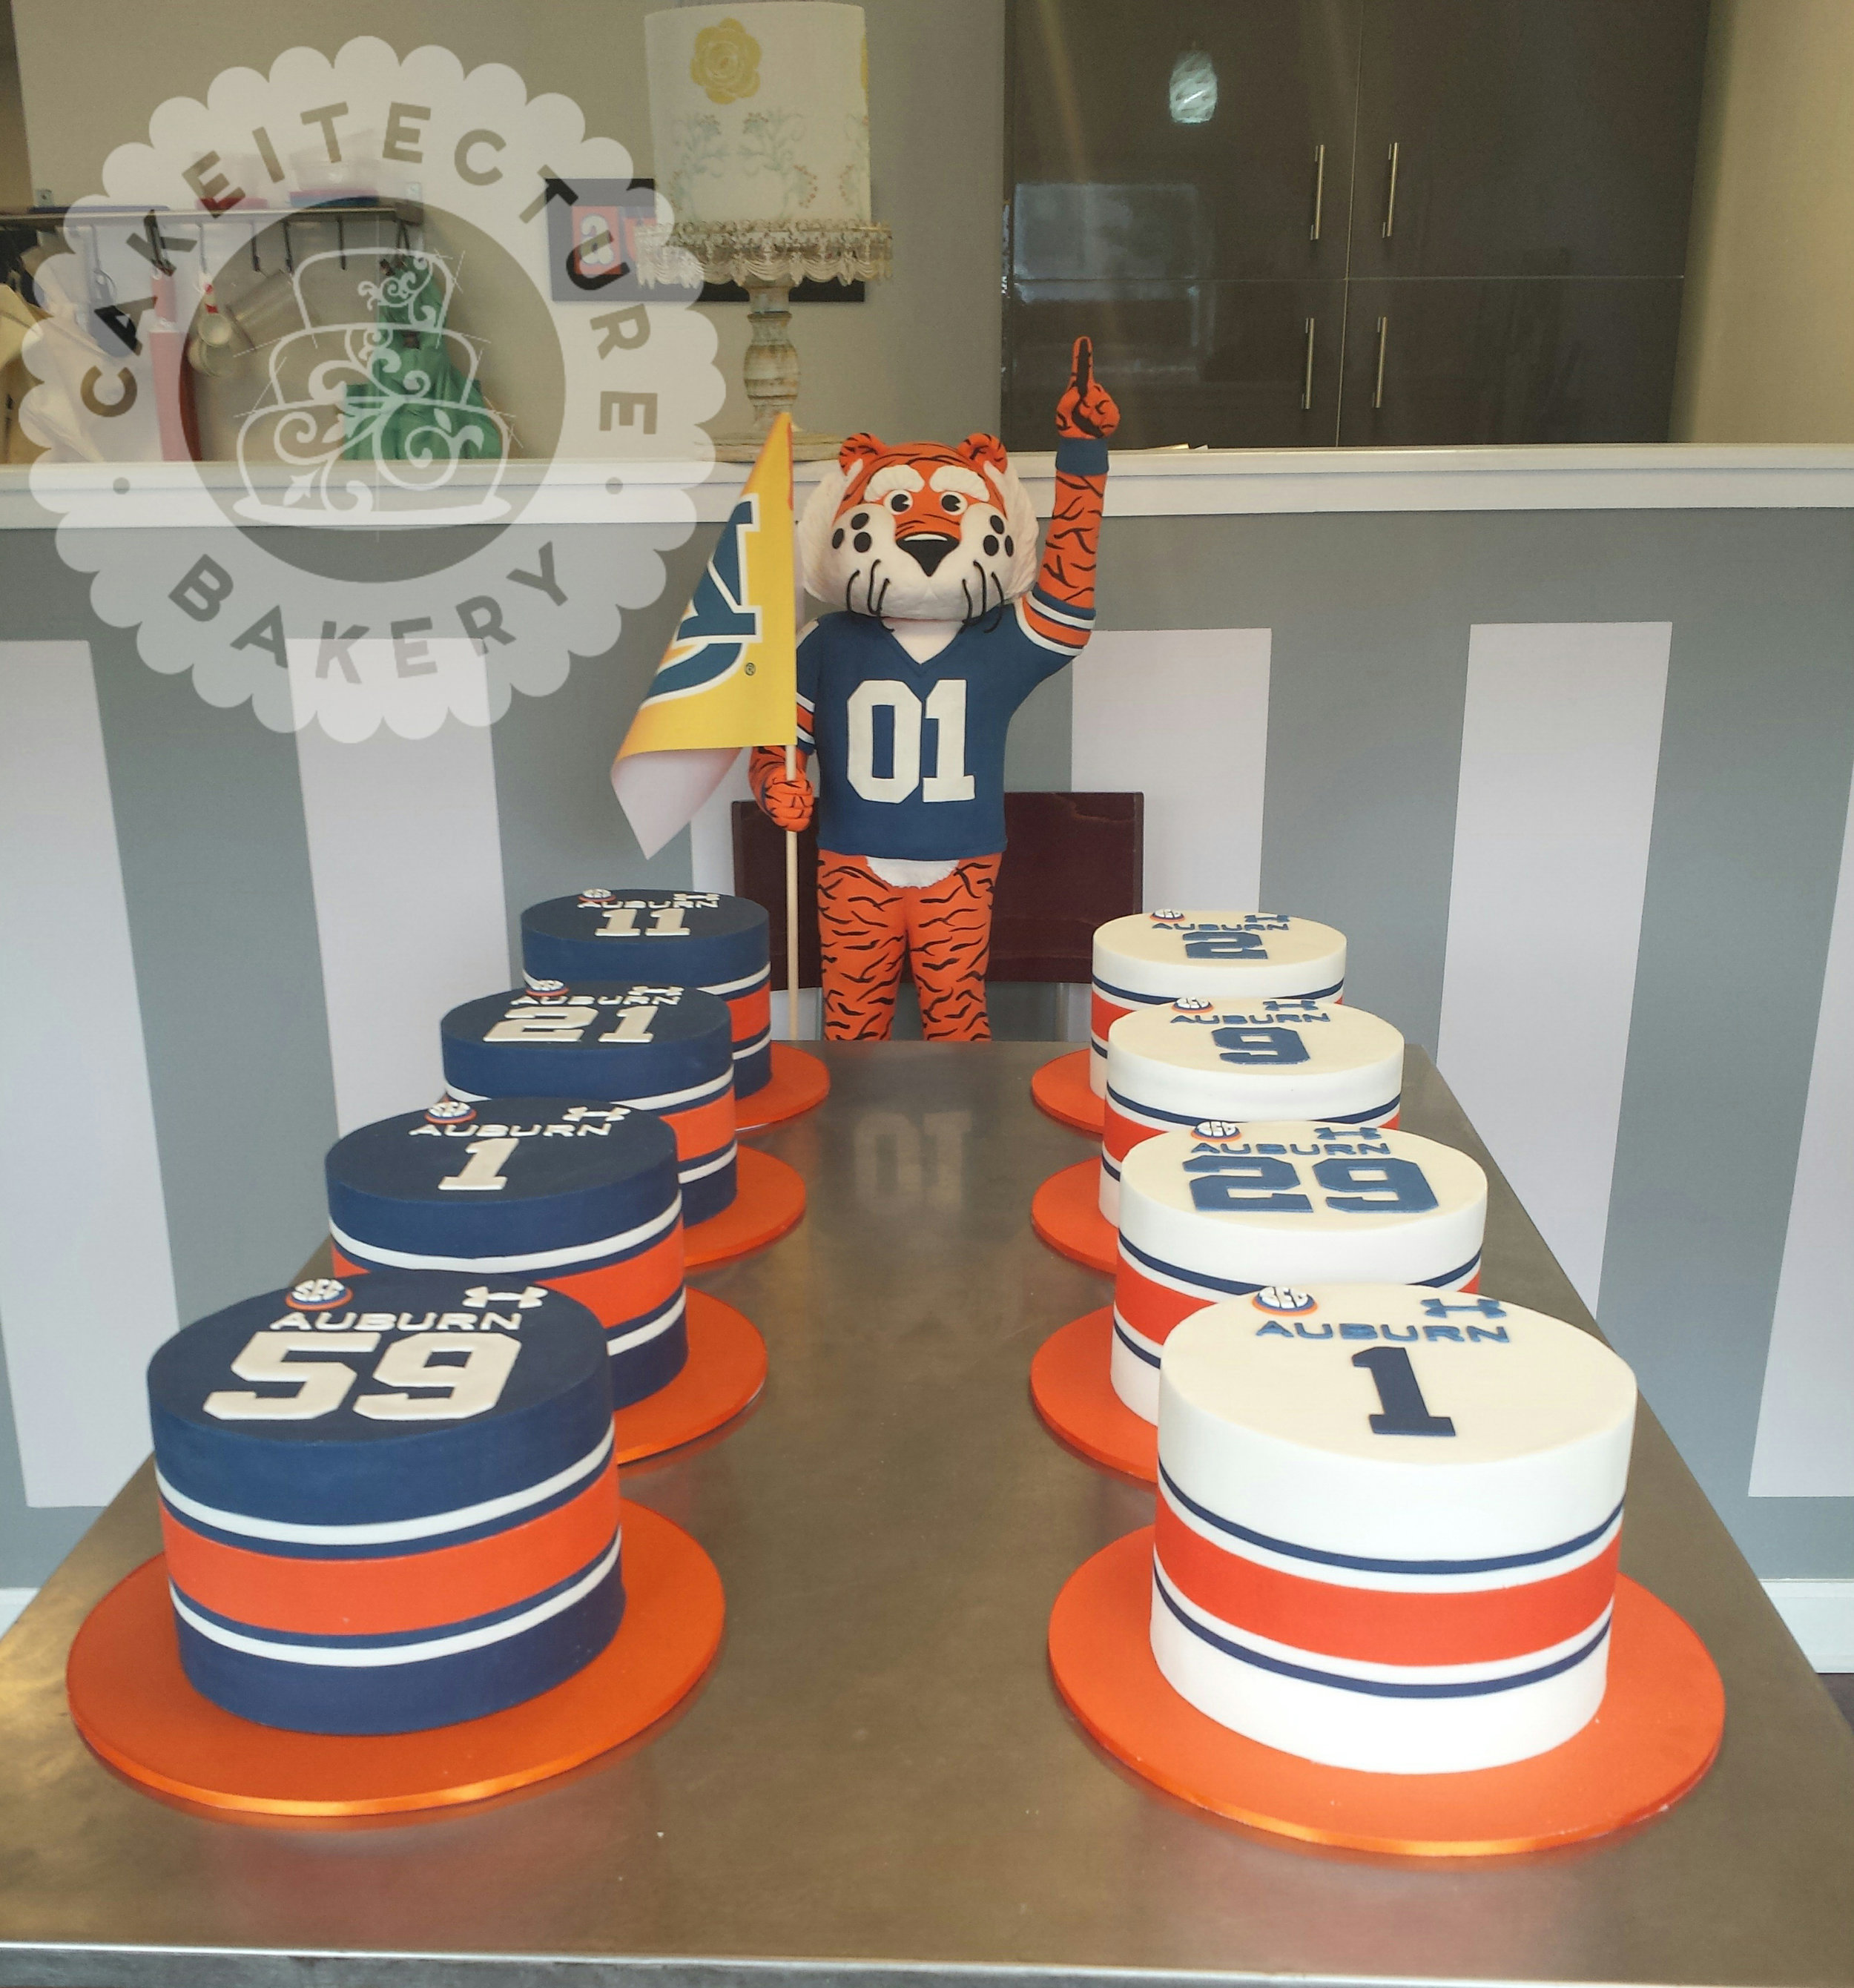 Cakeitecture Bakery AU cakes.jpg